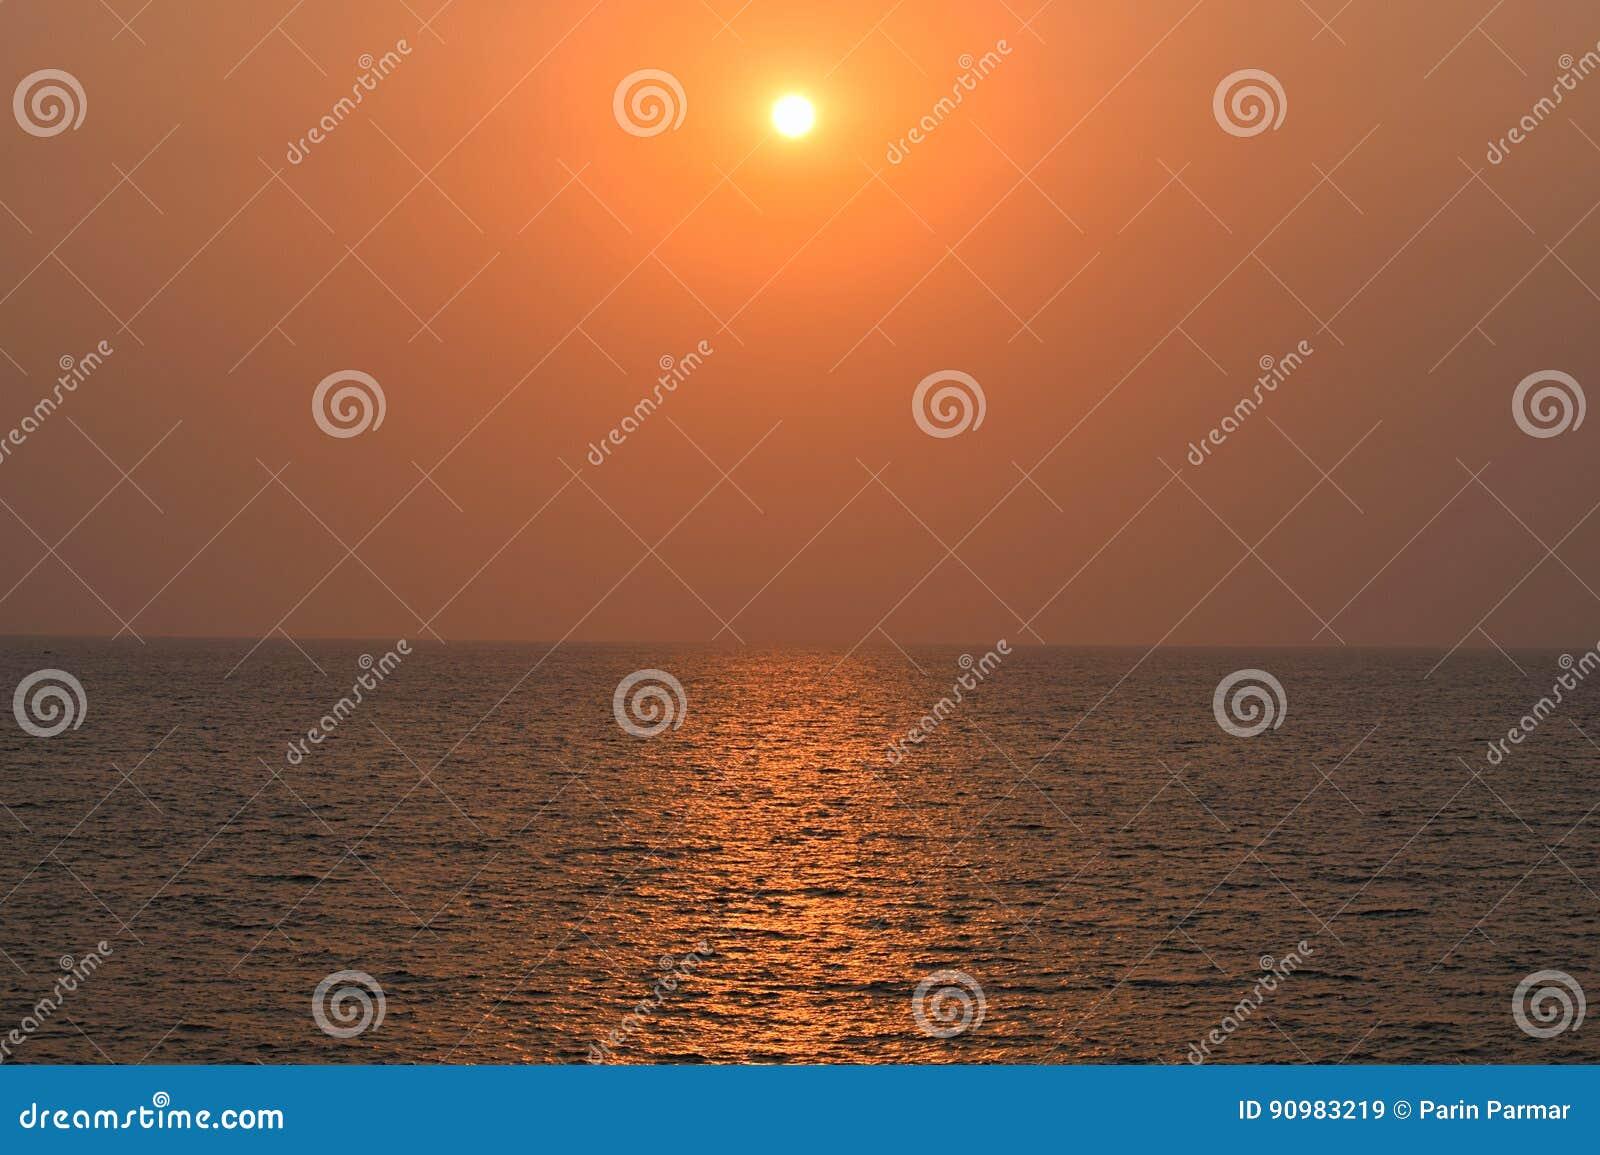 Goldener Sonnenuntergang über unbegrenztem Ozean